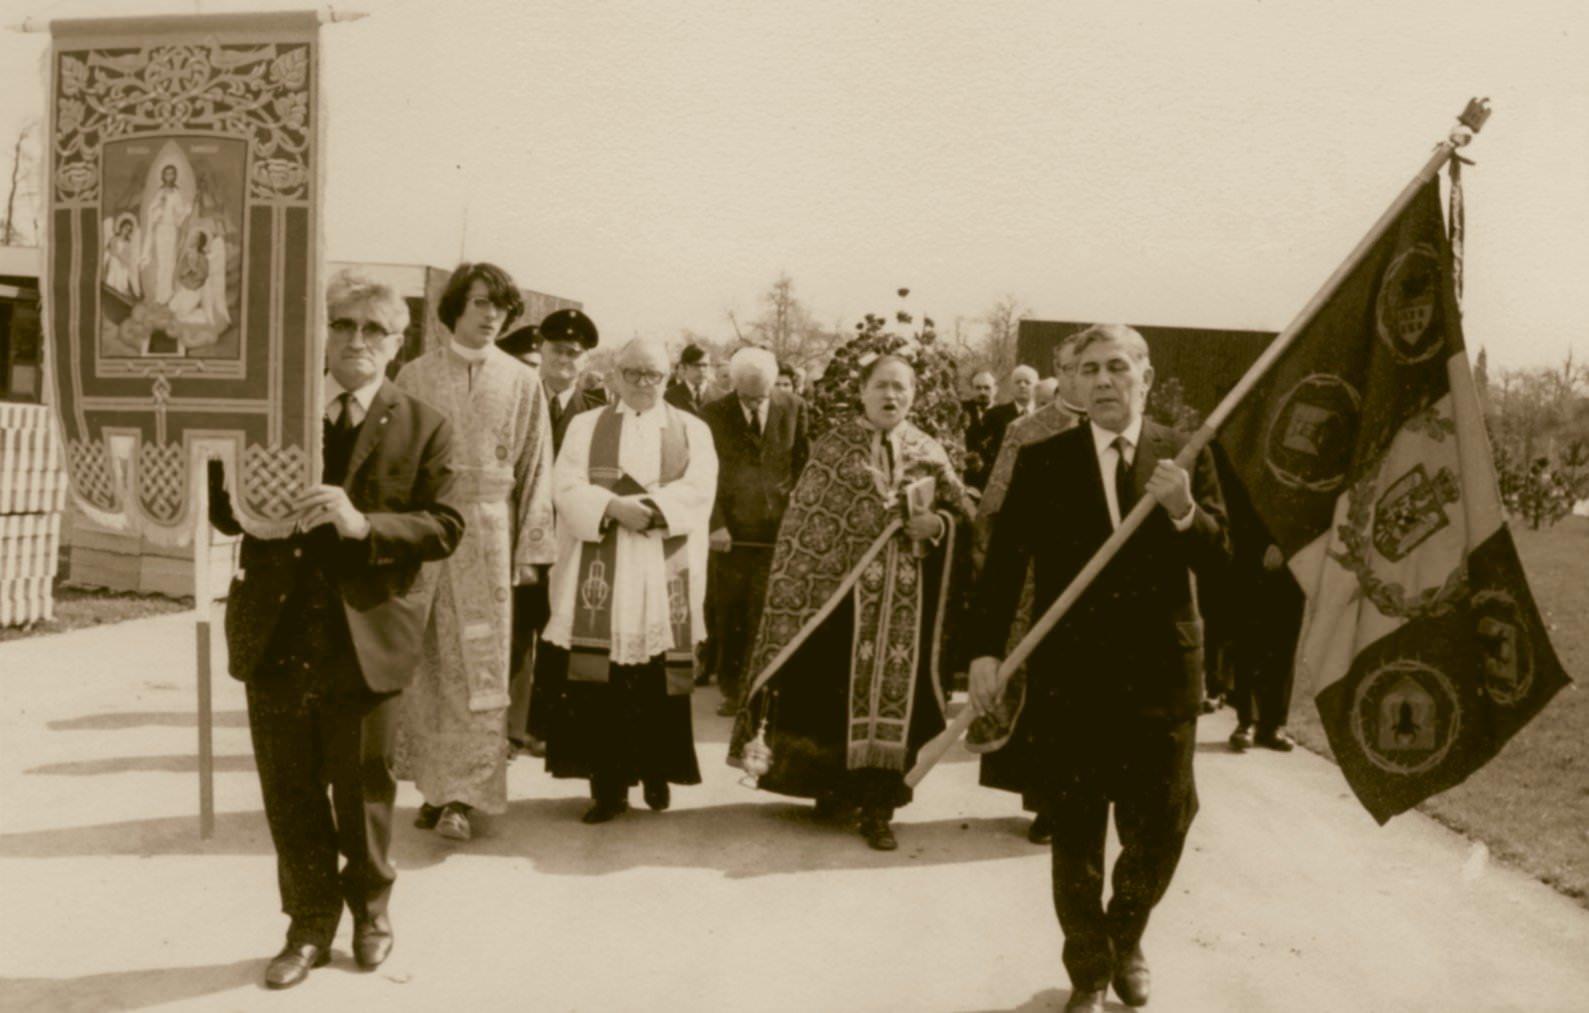 Mitropolitul Visarion Puiu - procesiunea de inmormantare hp 3